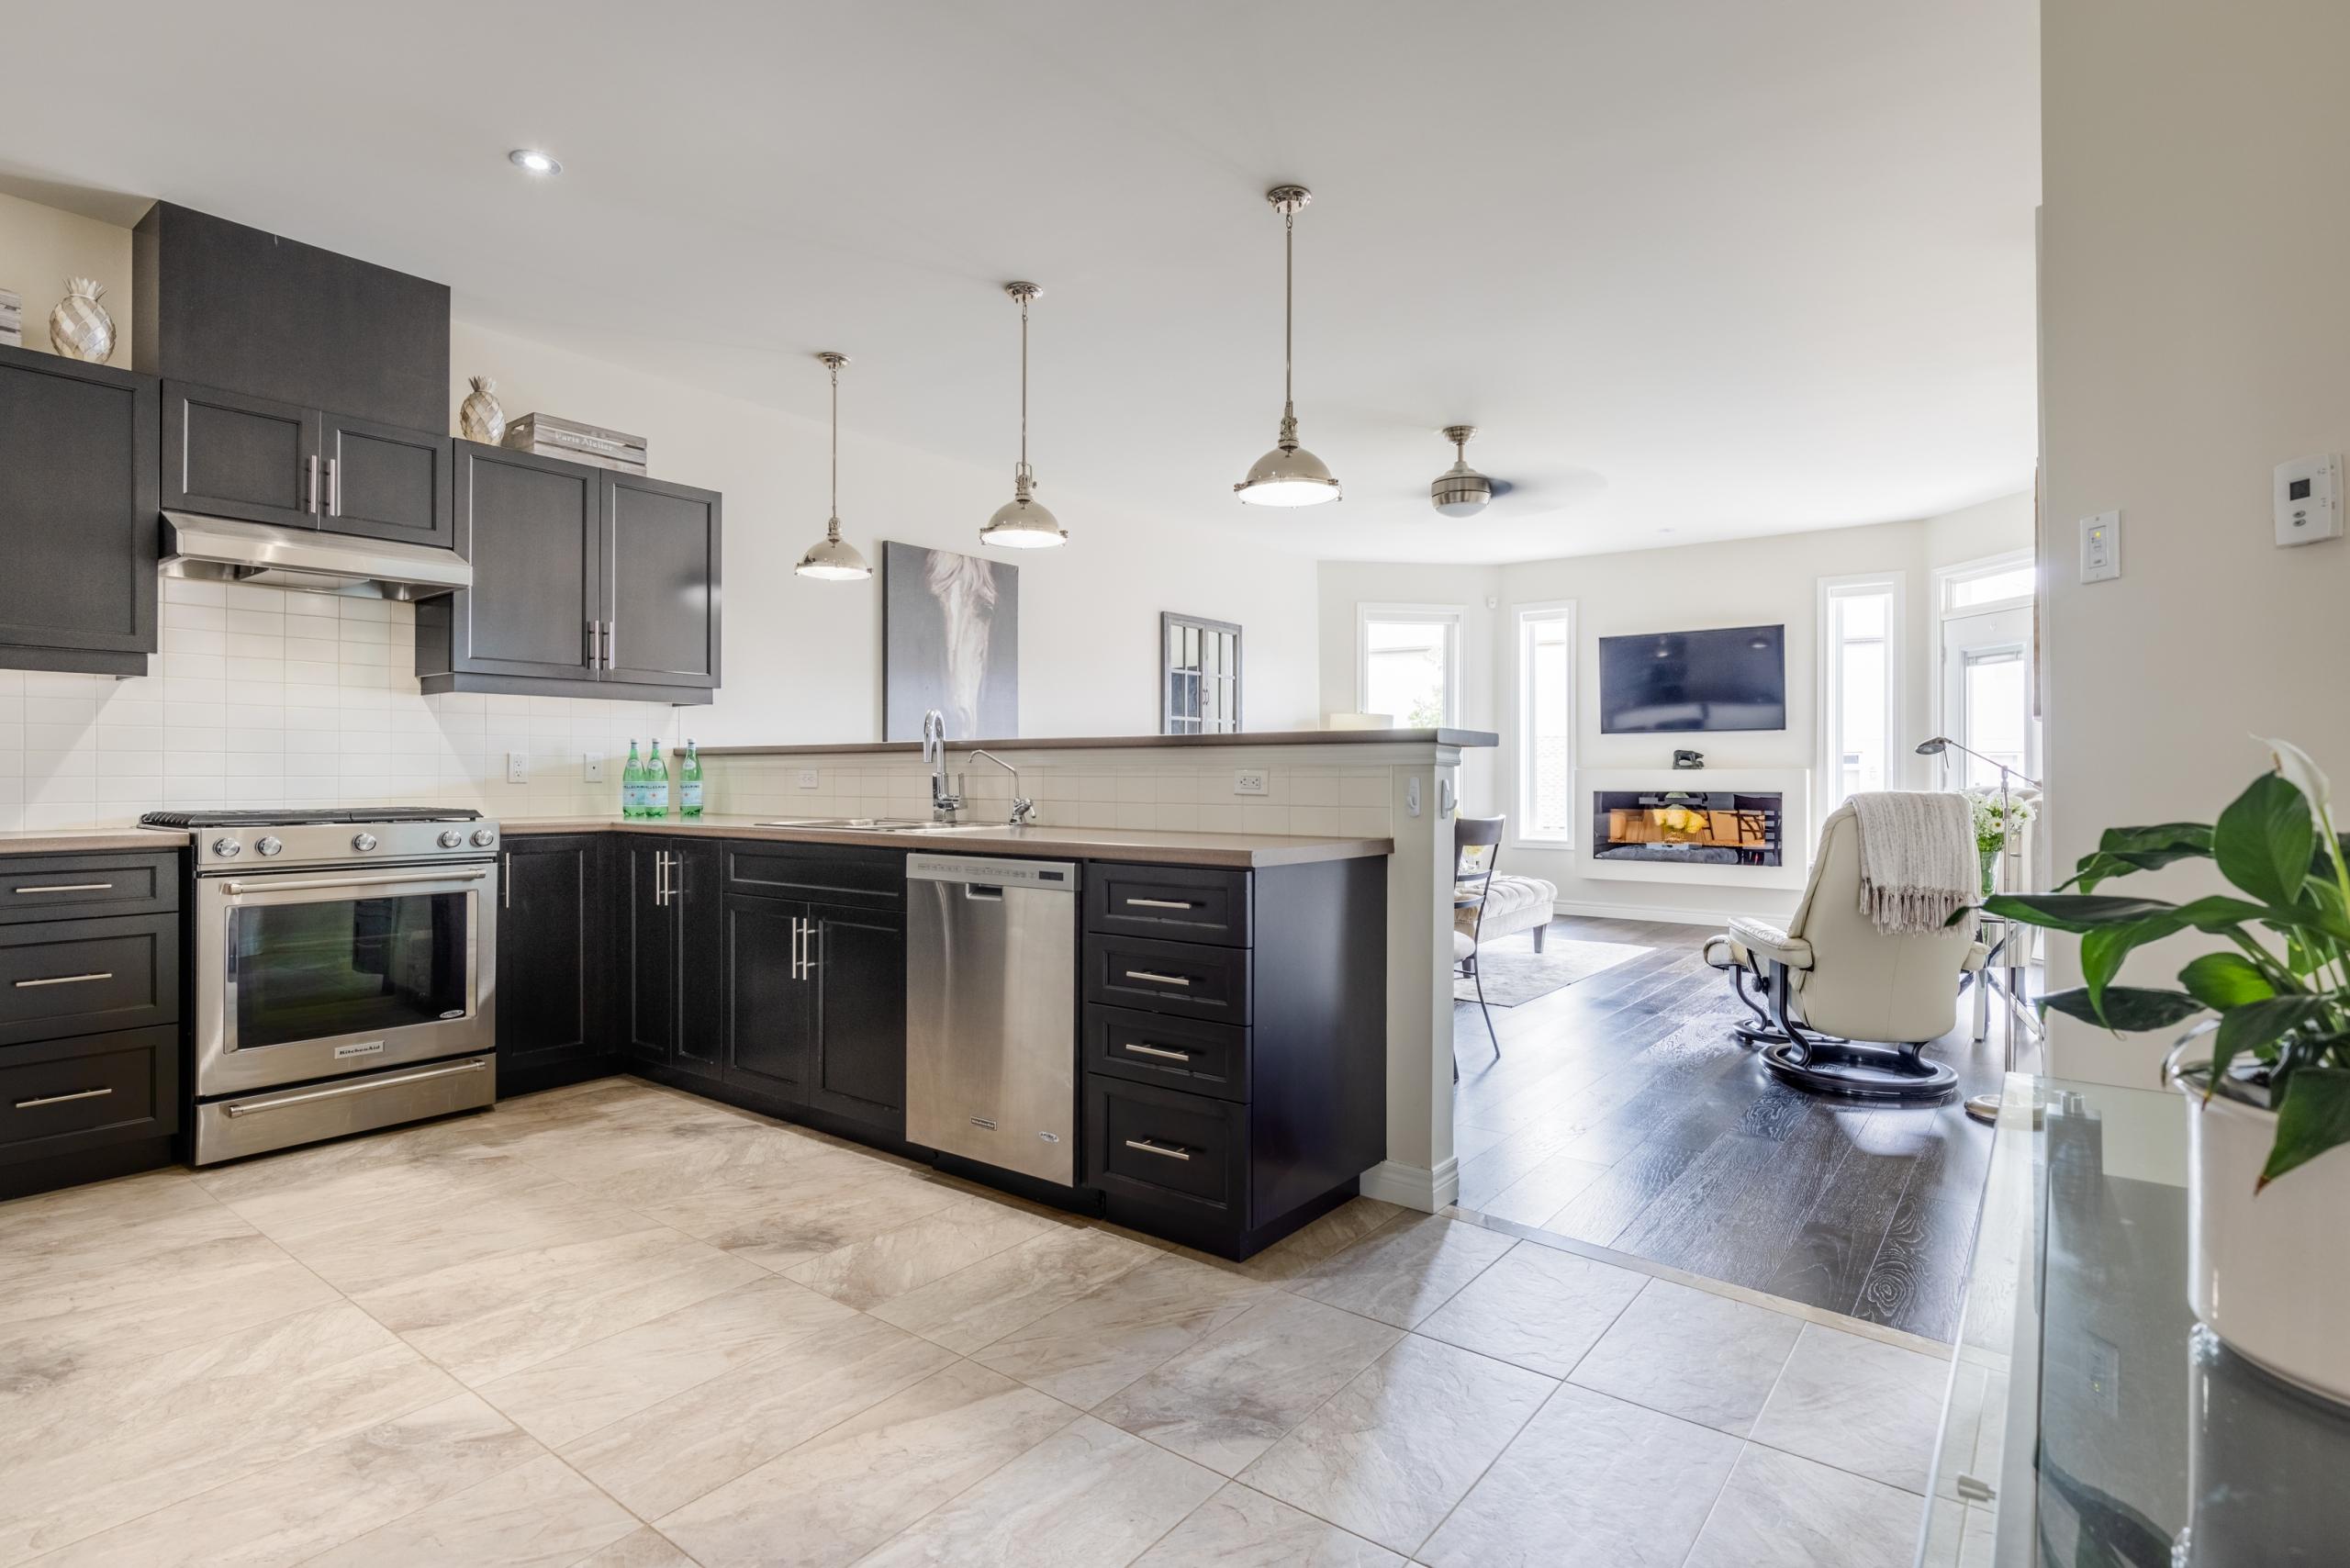 Kitchen featured at 7 Finton Lane, Binbrook, ON at Alex Irish & Associates